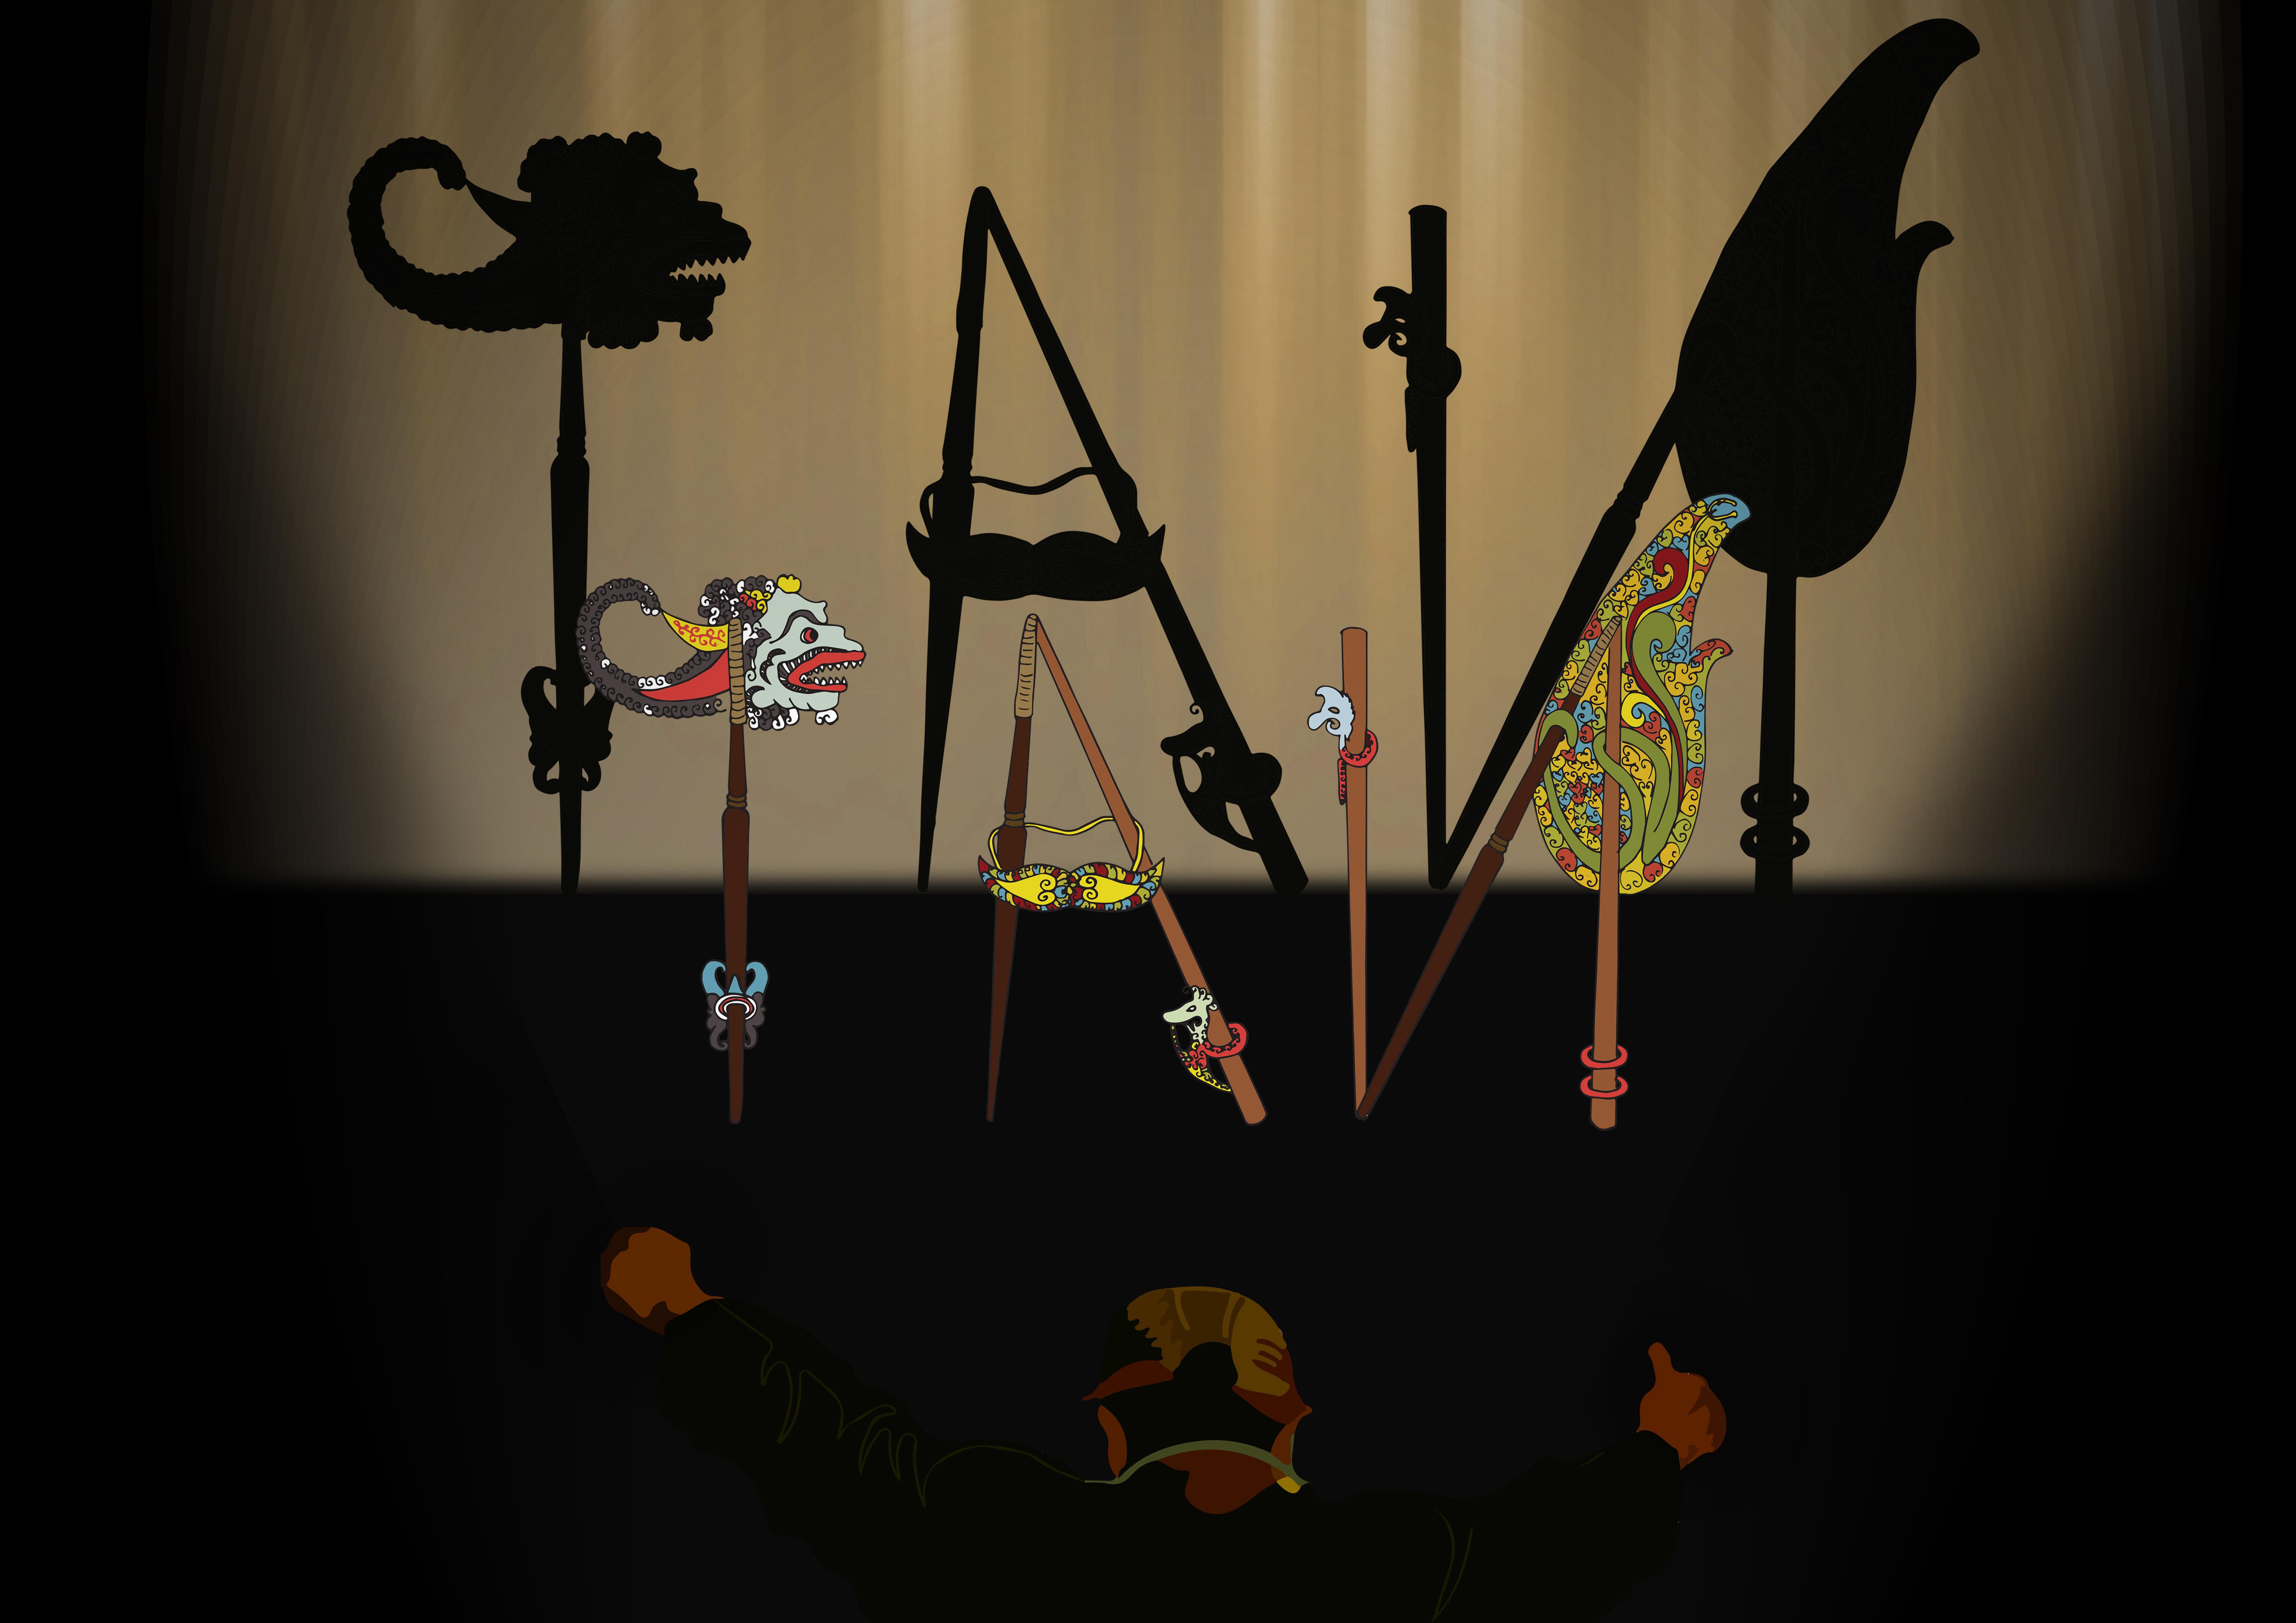 Shadow puppeteer final